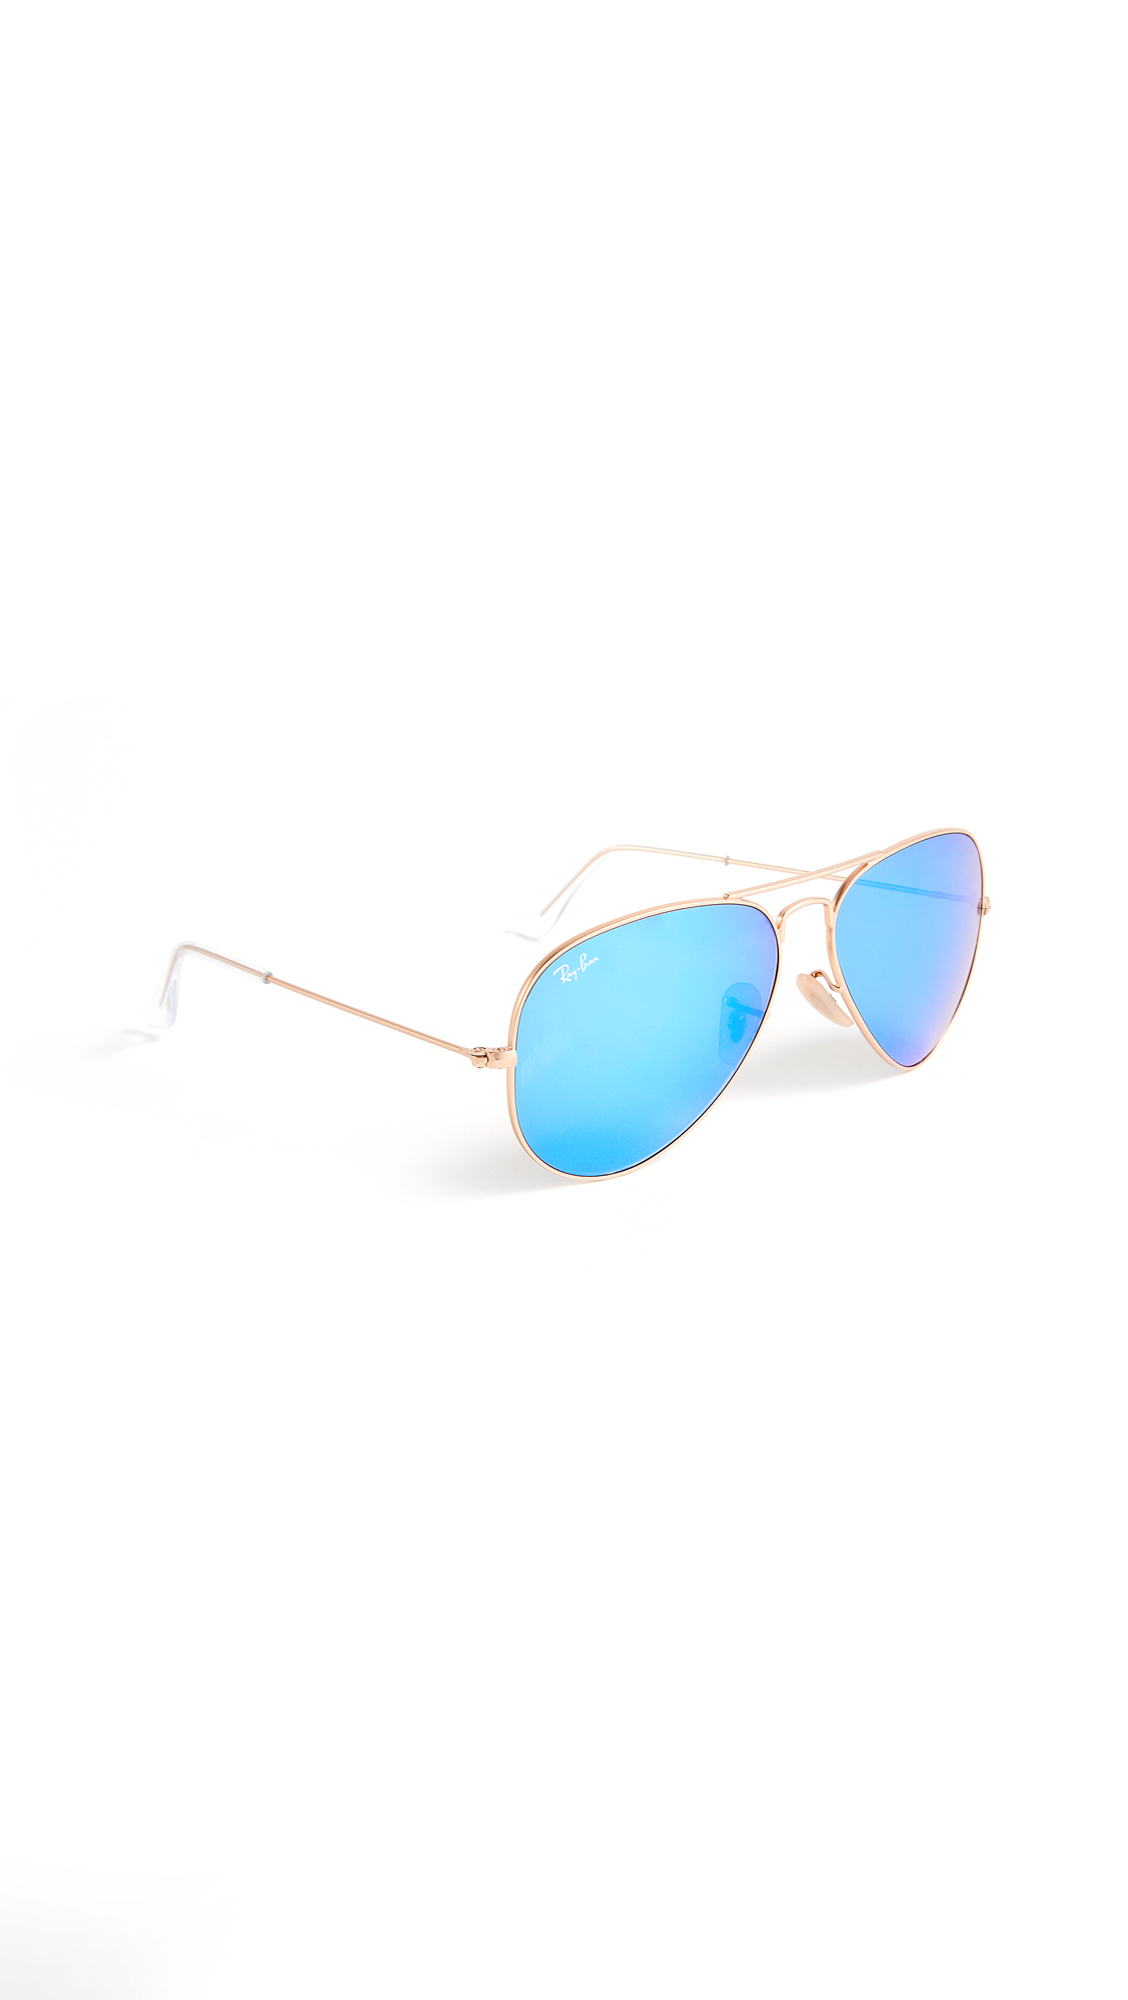 Ray-Ban Mirrored Matte Classic Aviator Sunglasses - Matte Gold/Blue Mirror